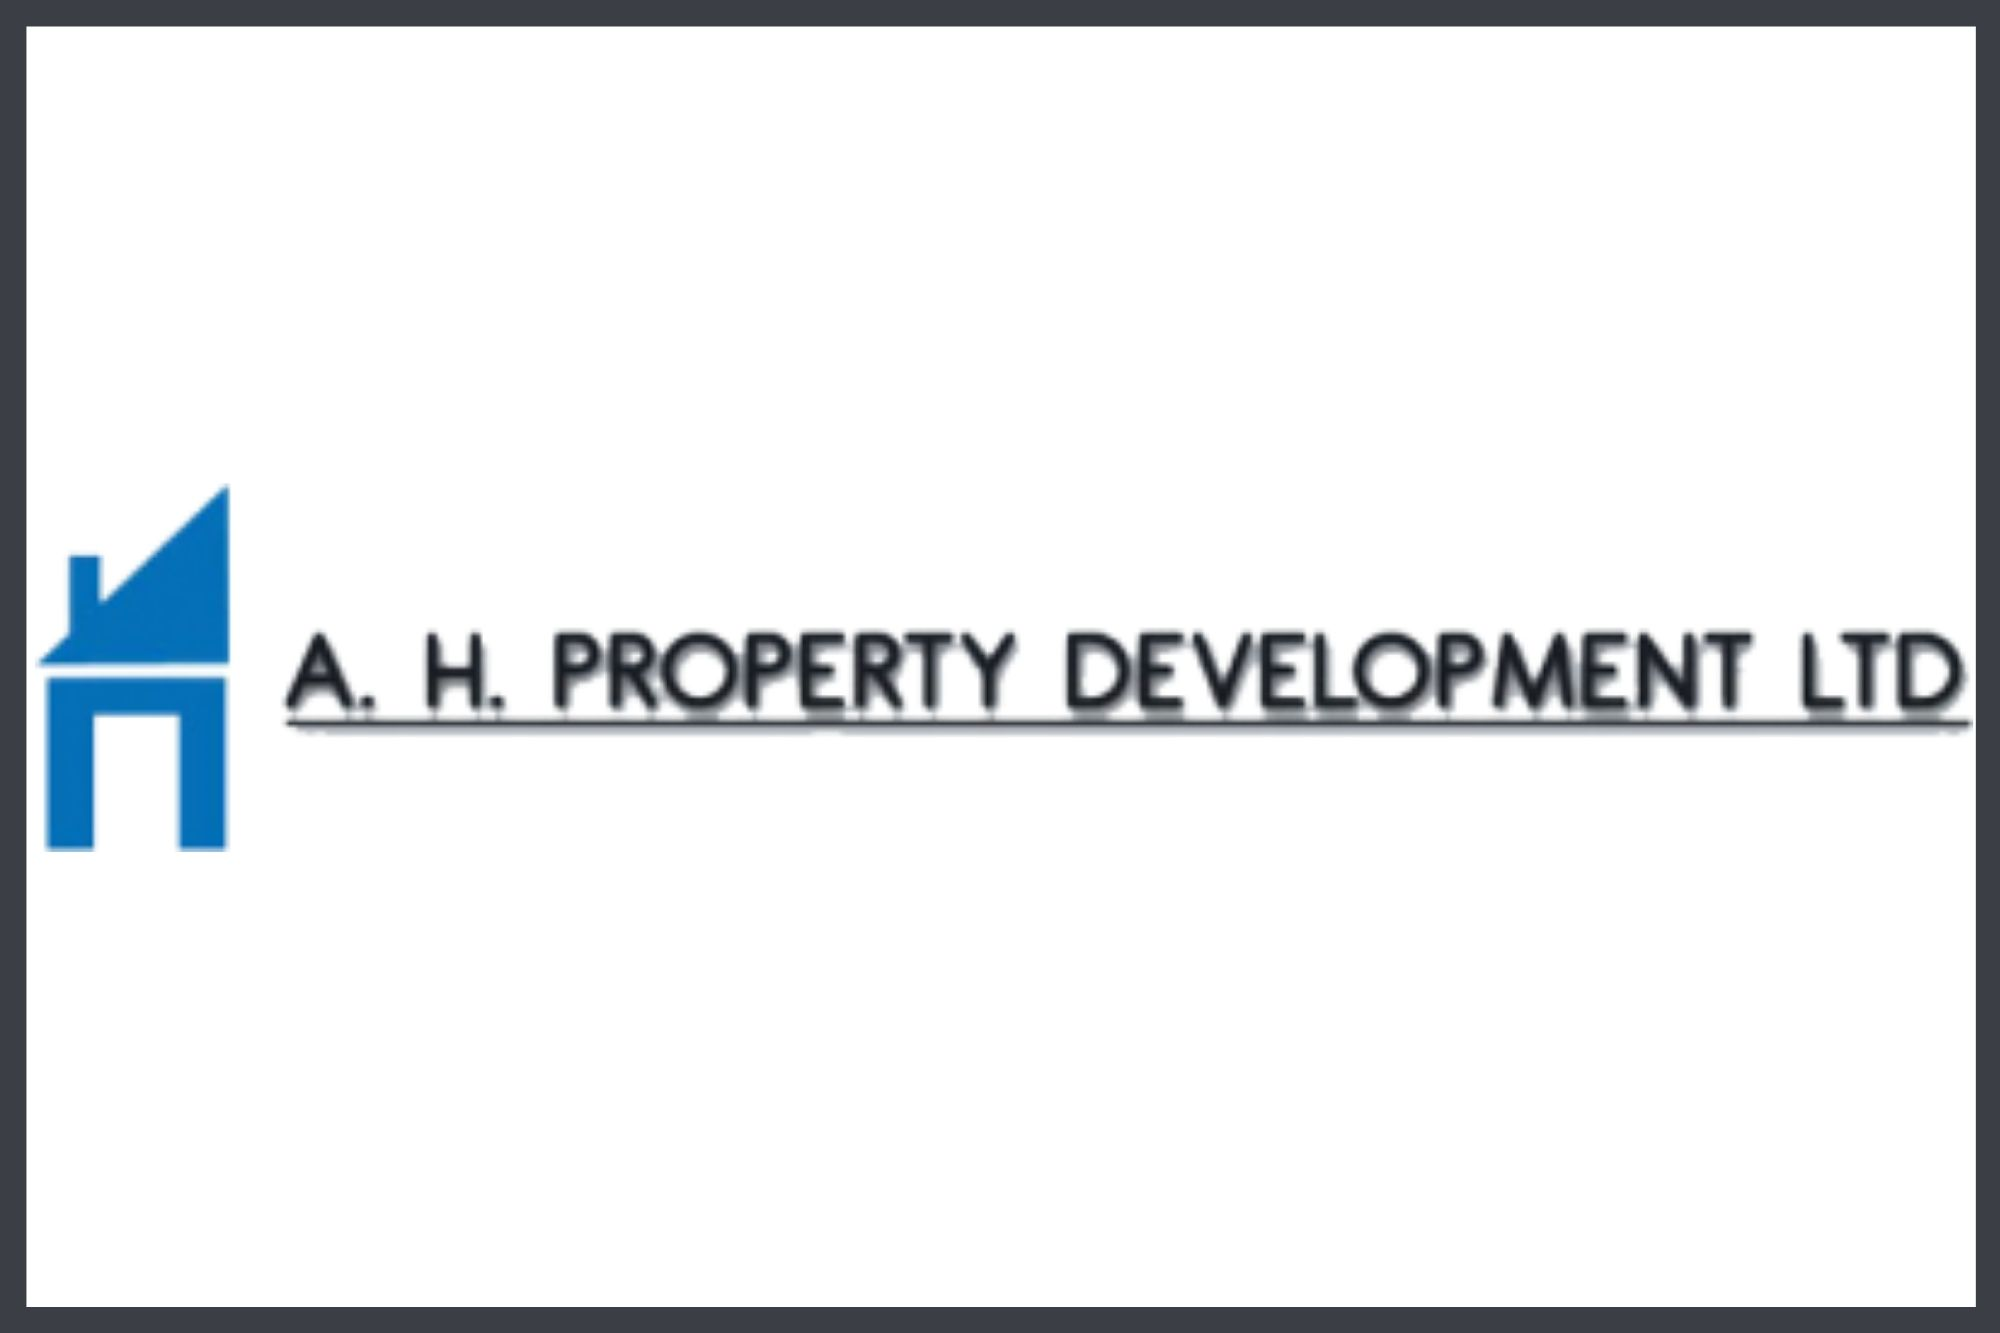 AH Property Development